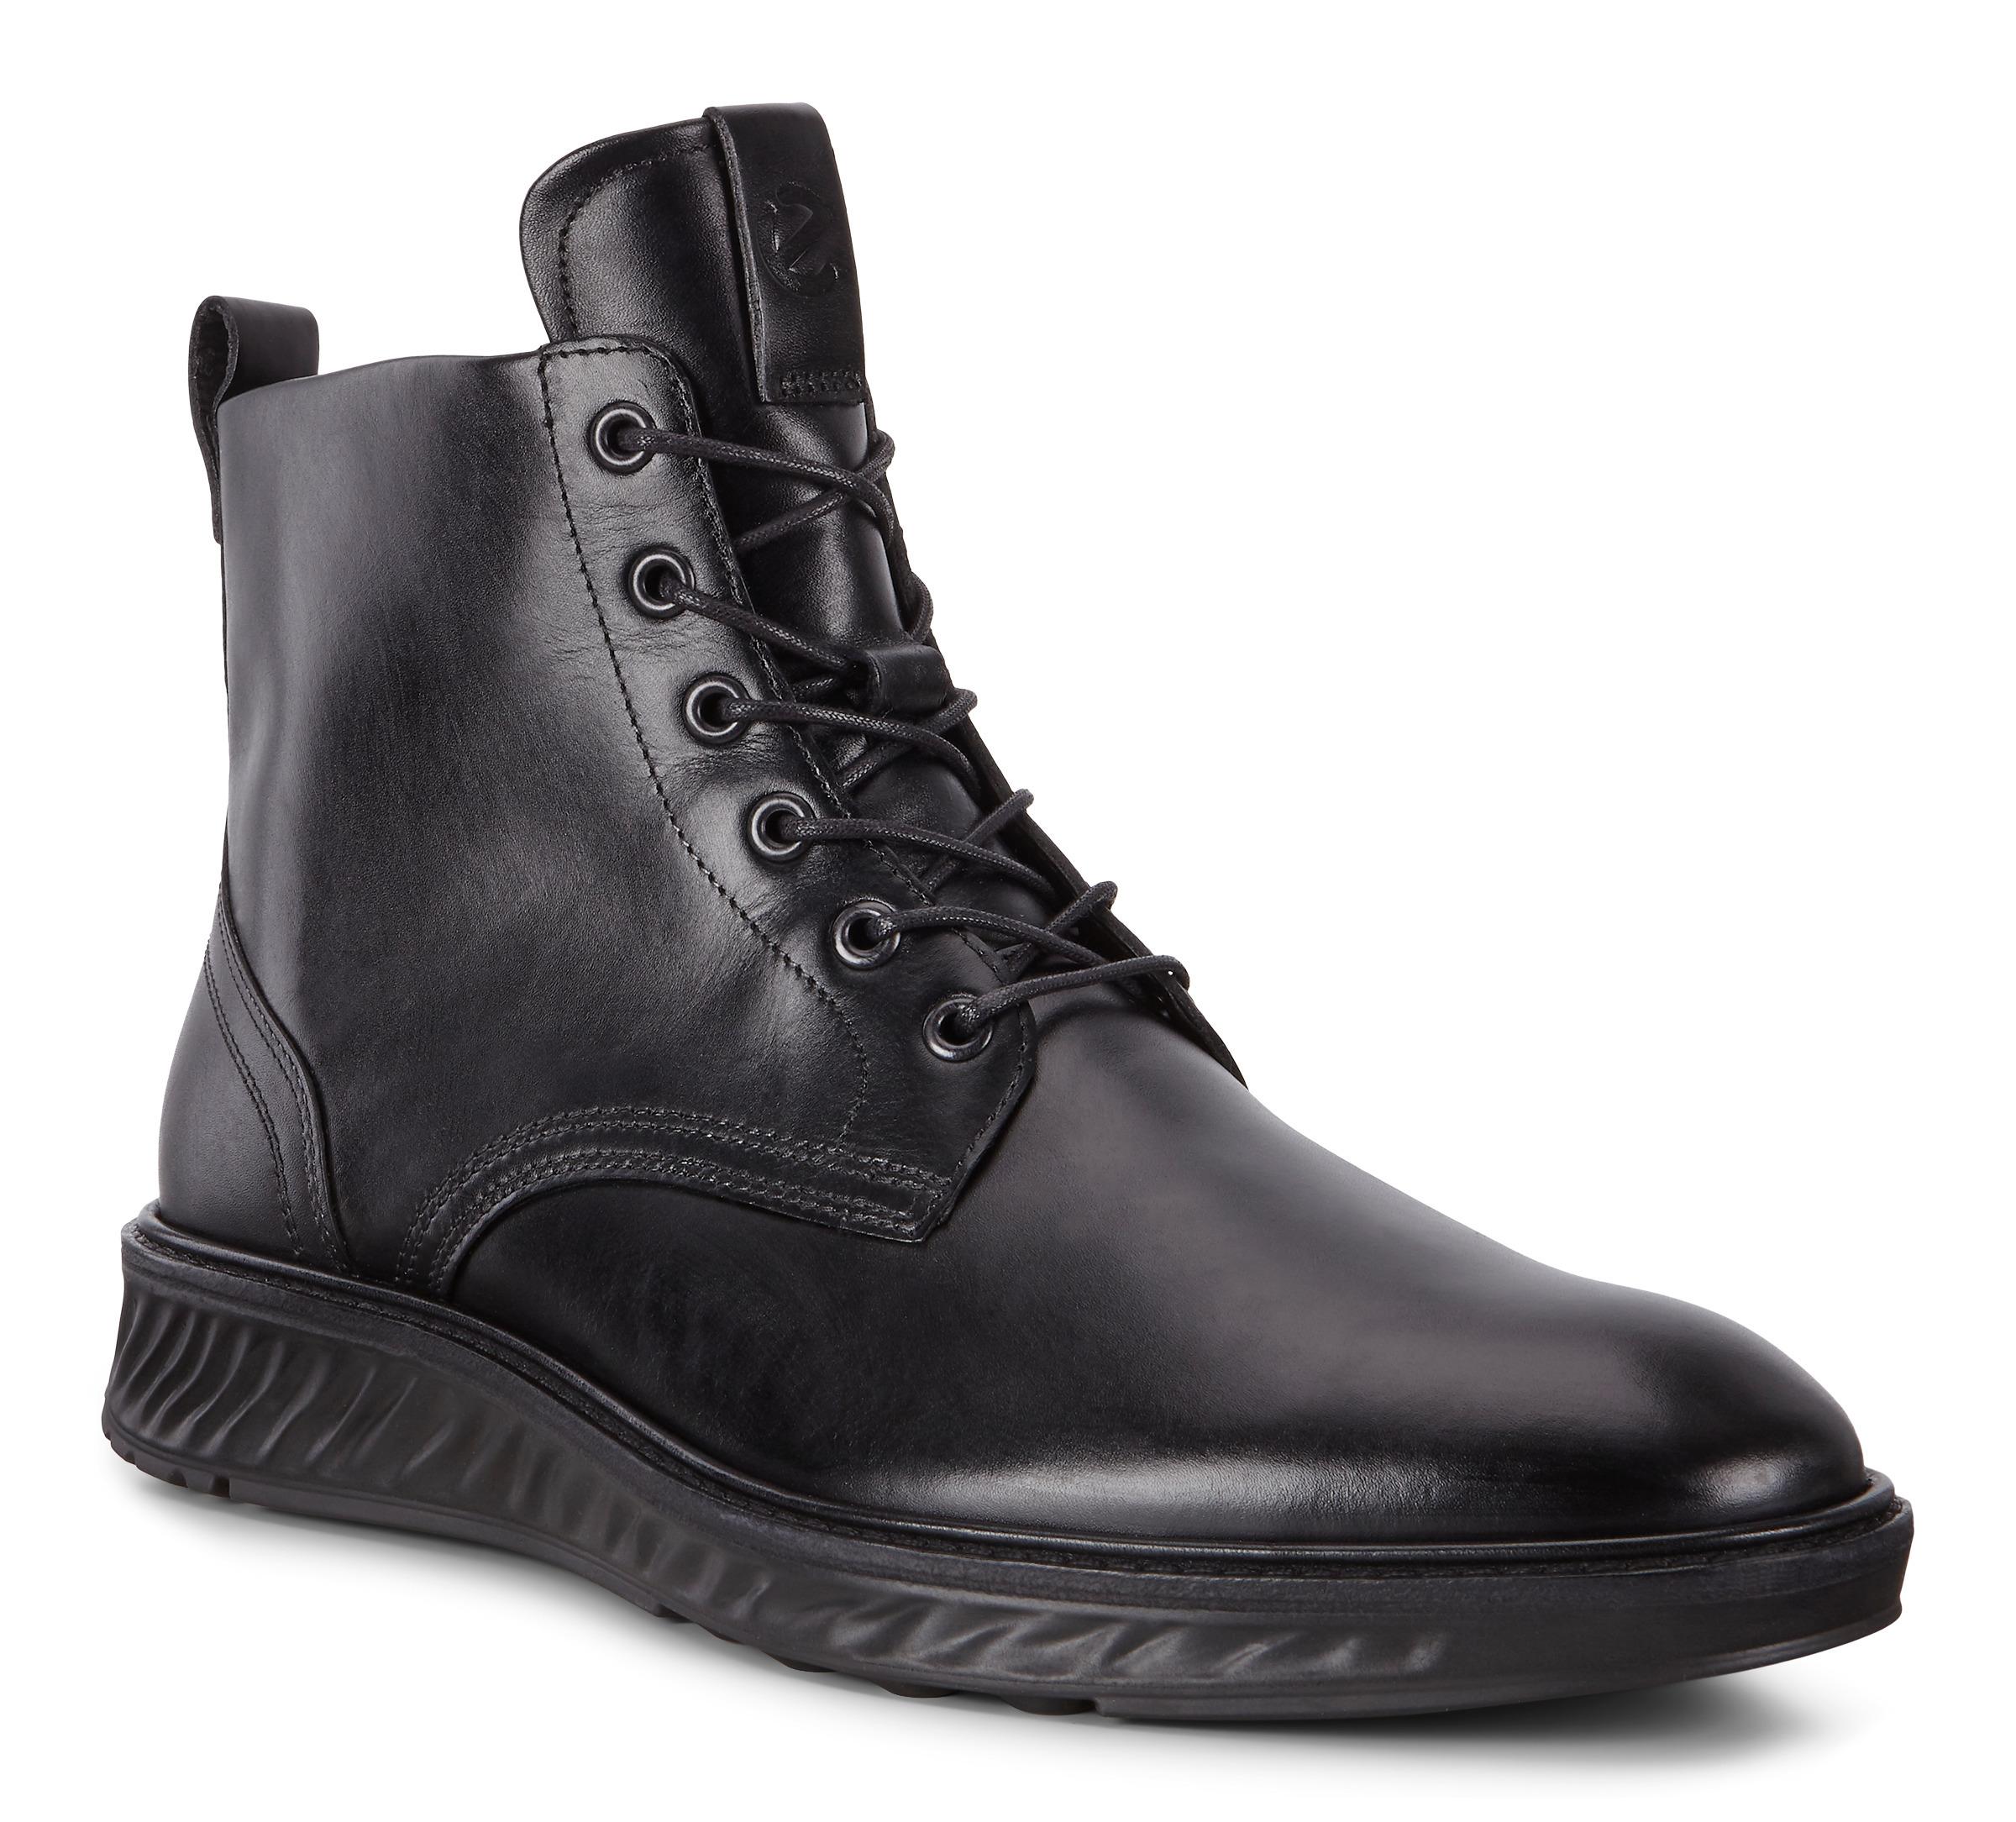 Herren Schuhe   Im offiziellen ECCO® Shop einkaufen